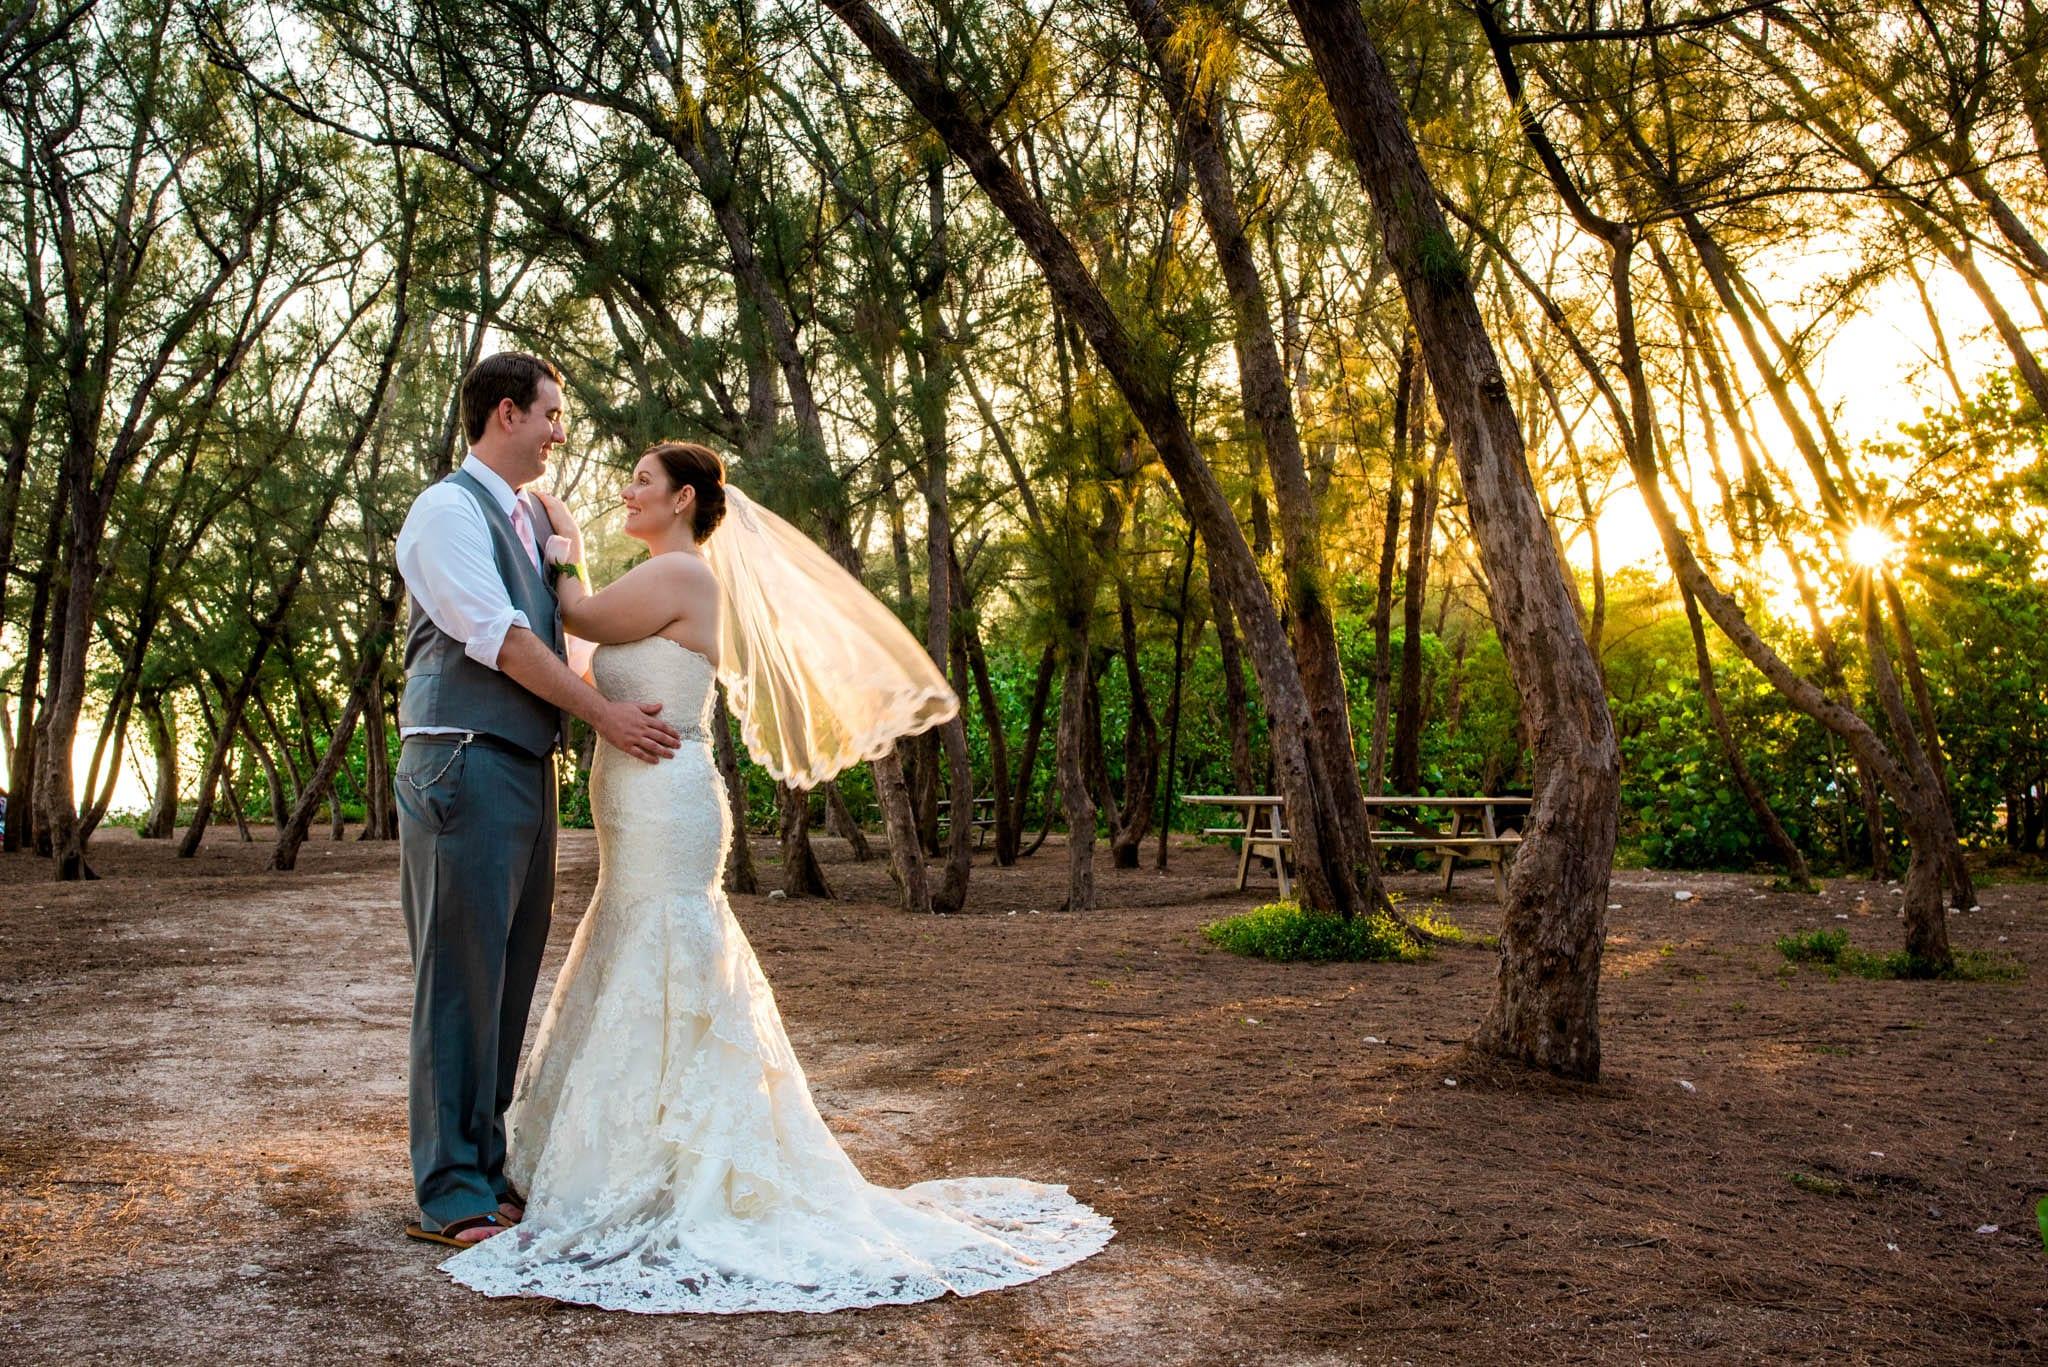 Heather Jeff Key West Wedding Photographer Fort Zachary Taylor 27 - Heather & Jeff - Key West Wedding Photographer - Fort Zachary Taylor